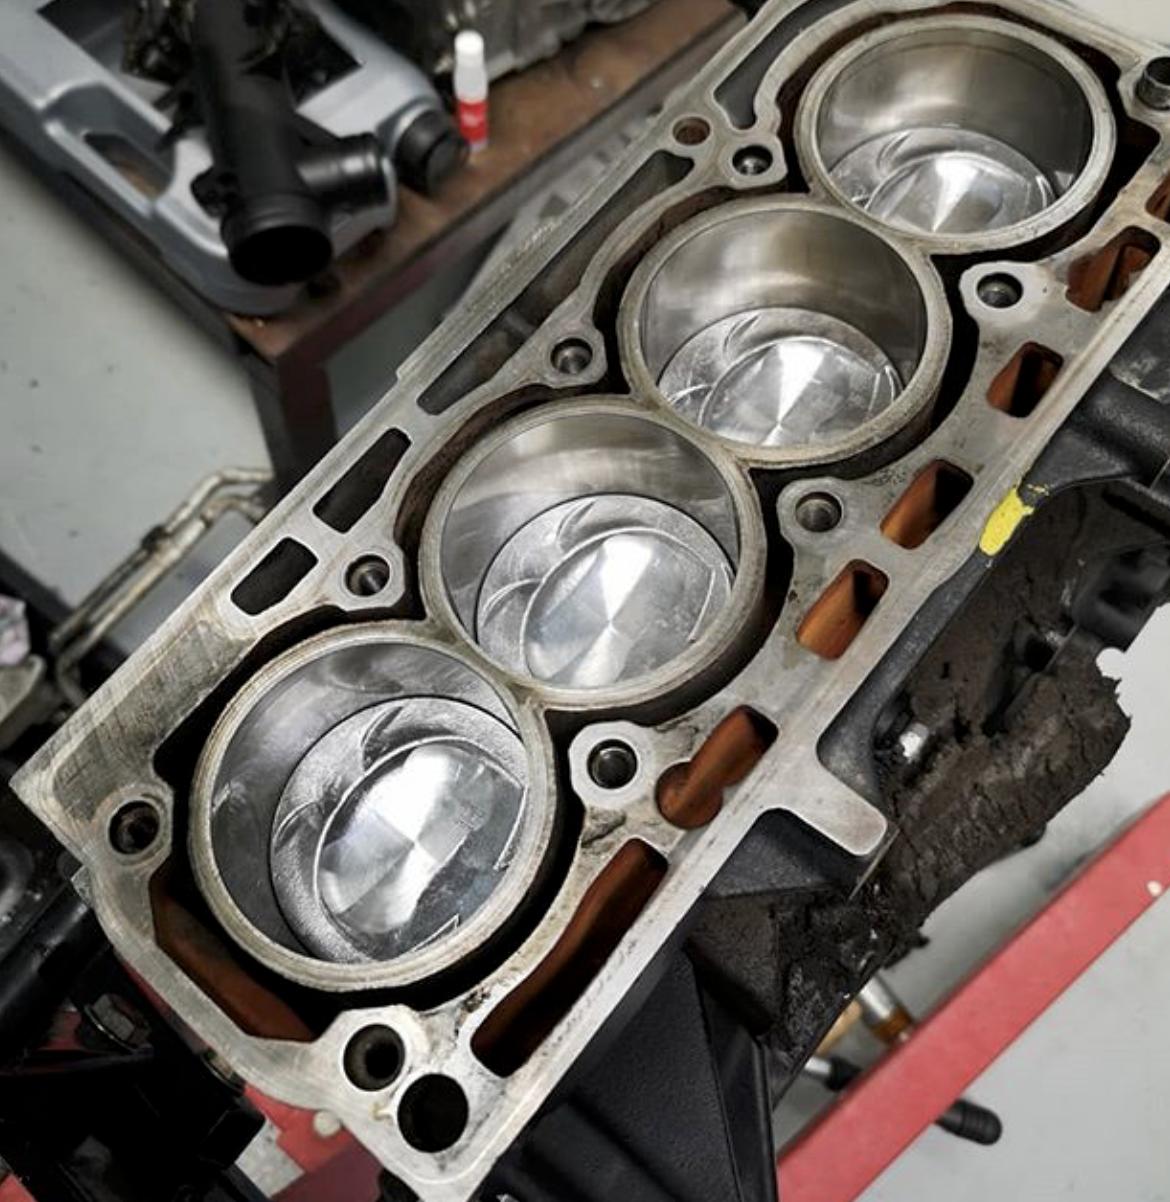 VW 1.4 Engine problems